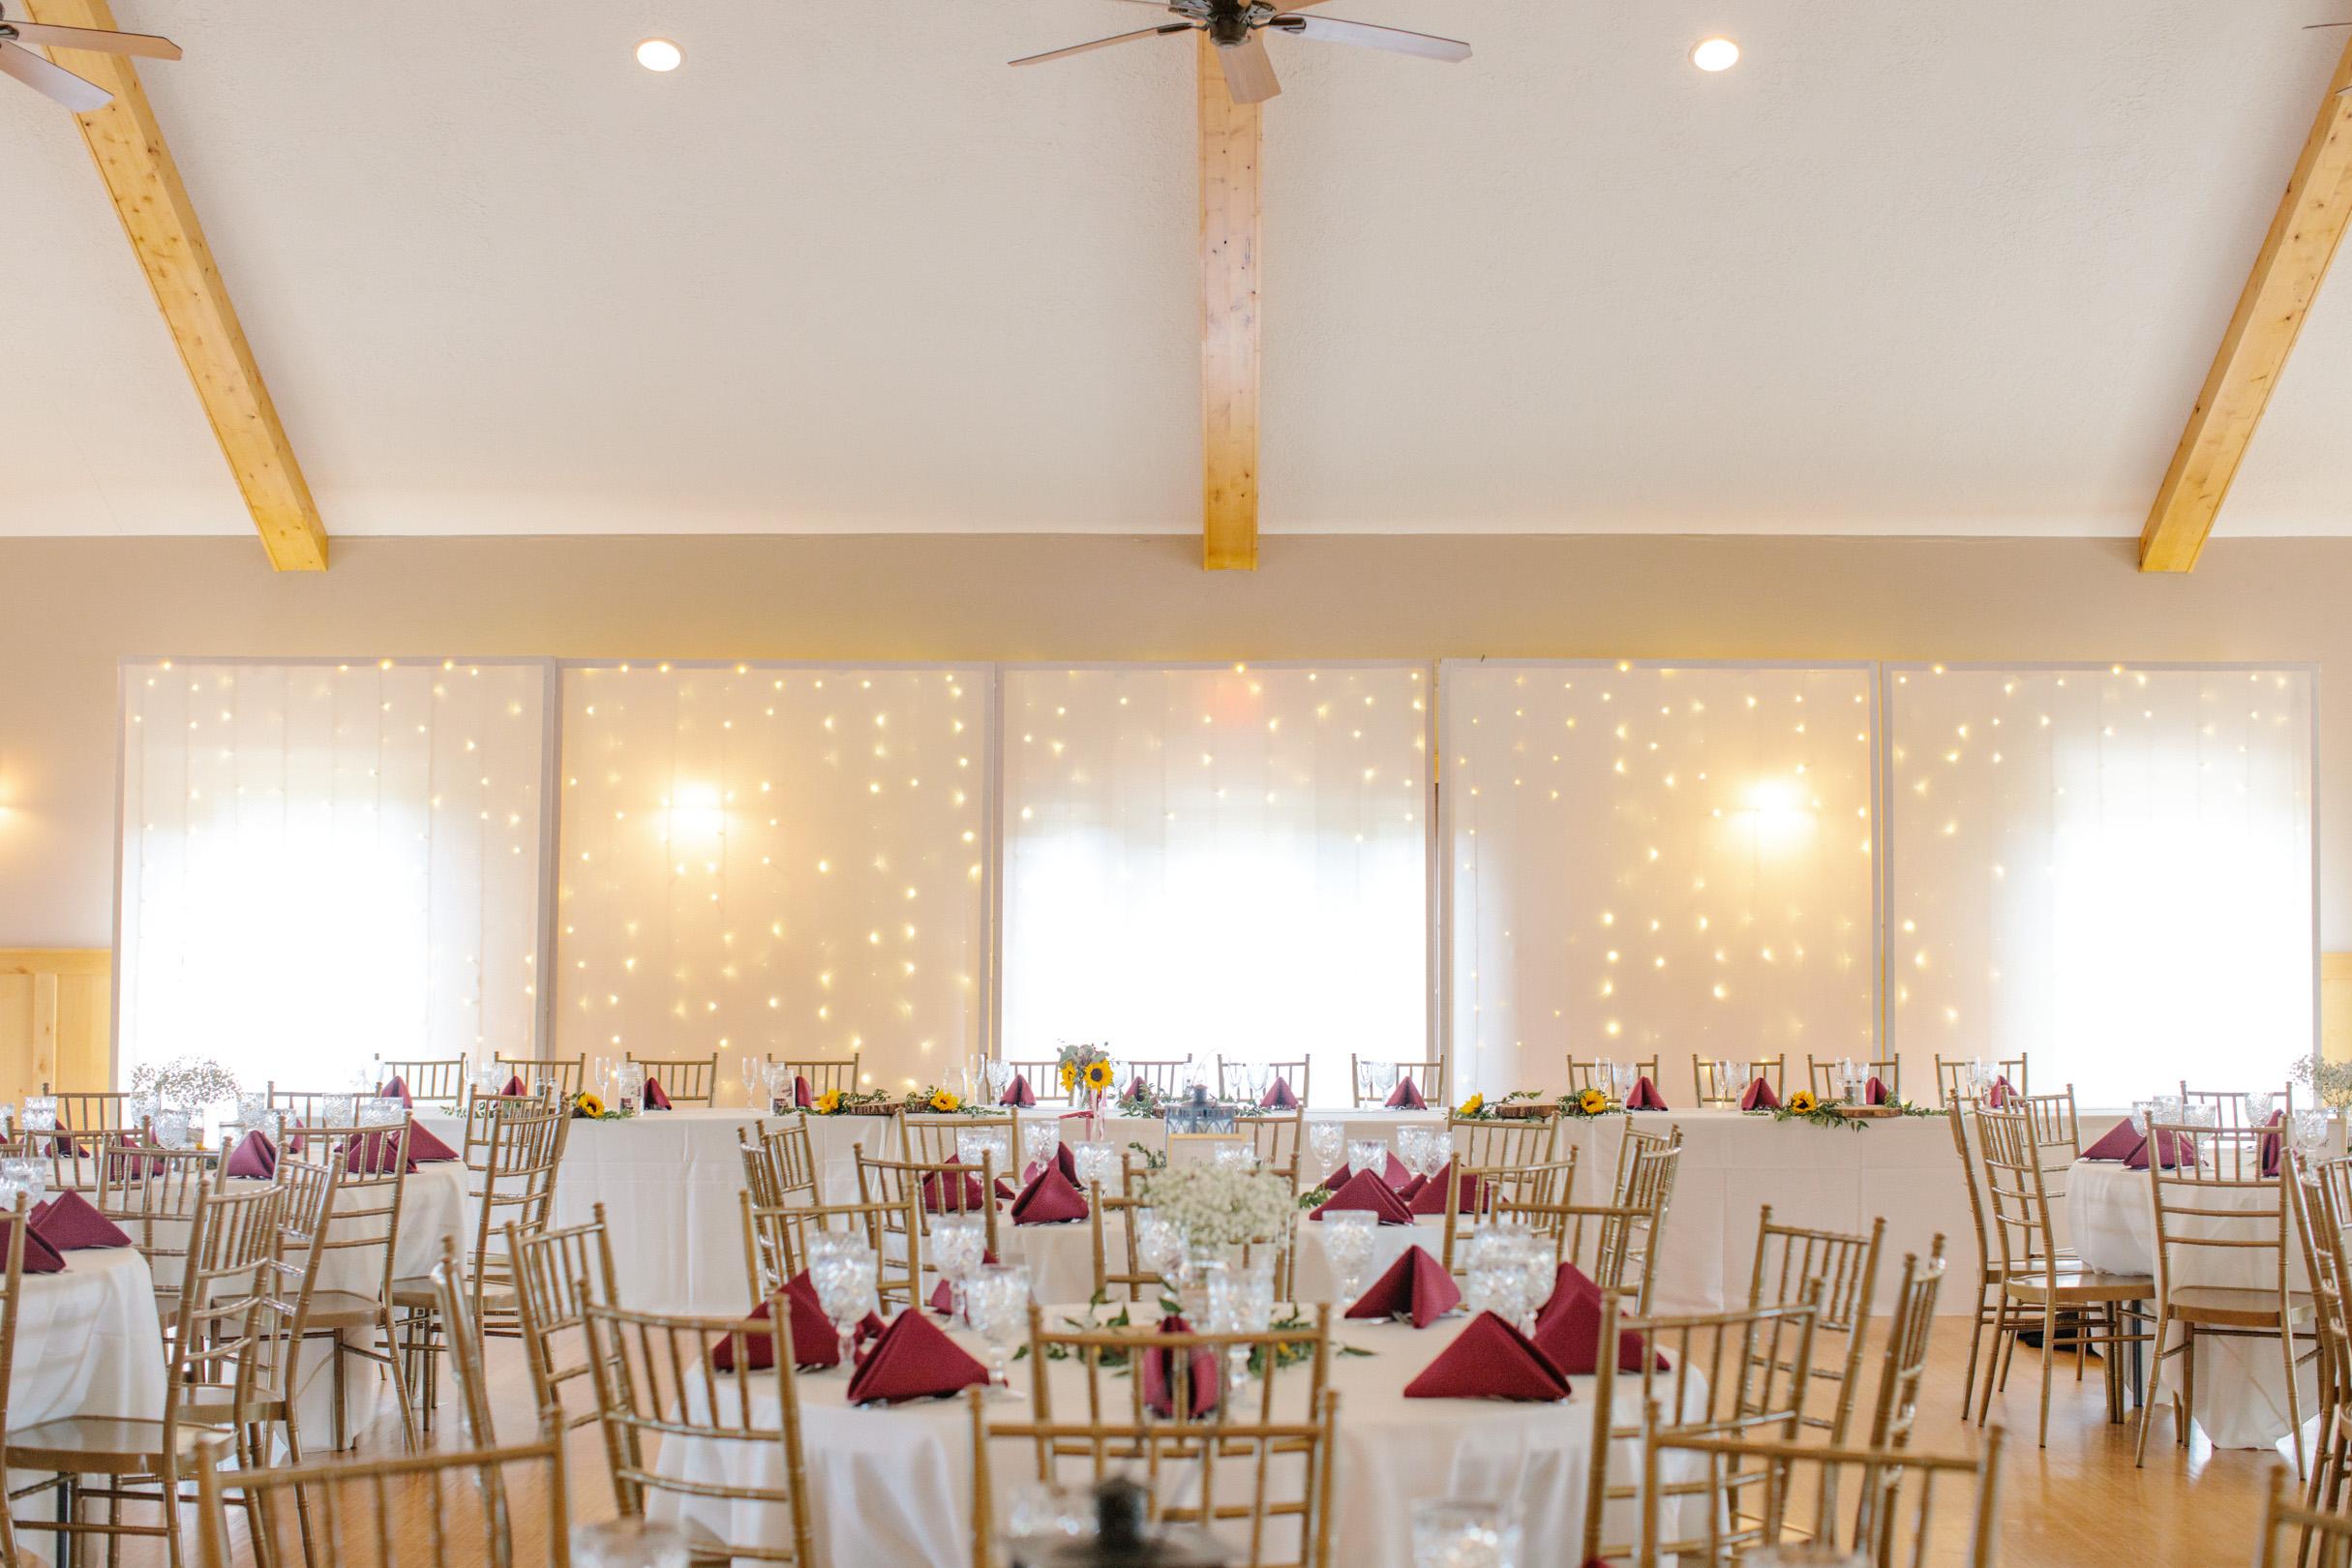 gabby_david_the_chateau_white_oak_wedding_094.jpg